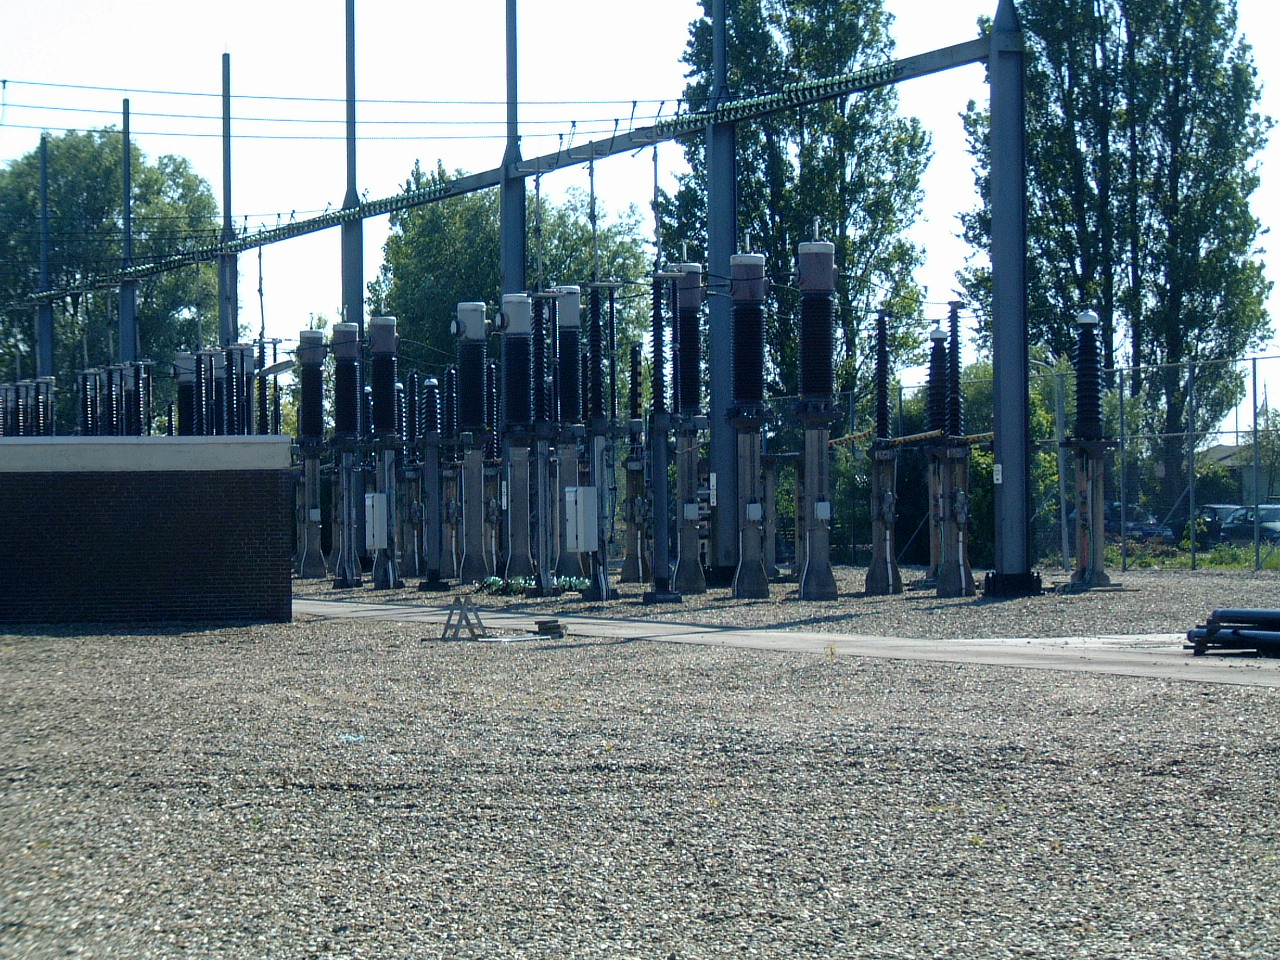 external transient voltage